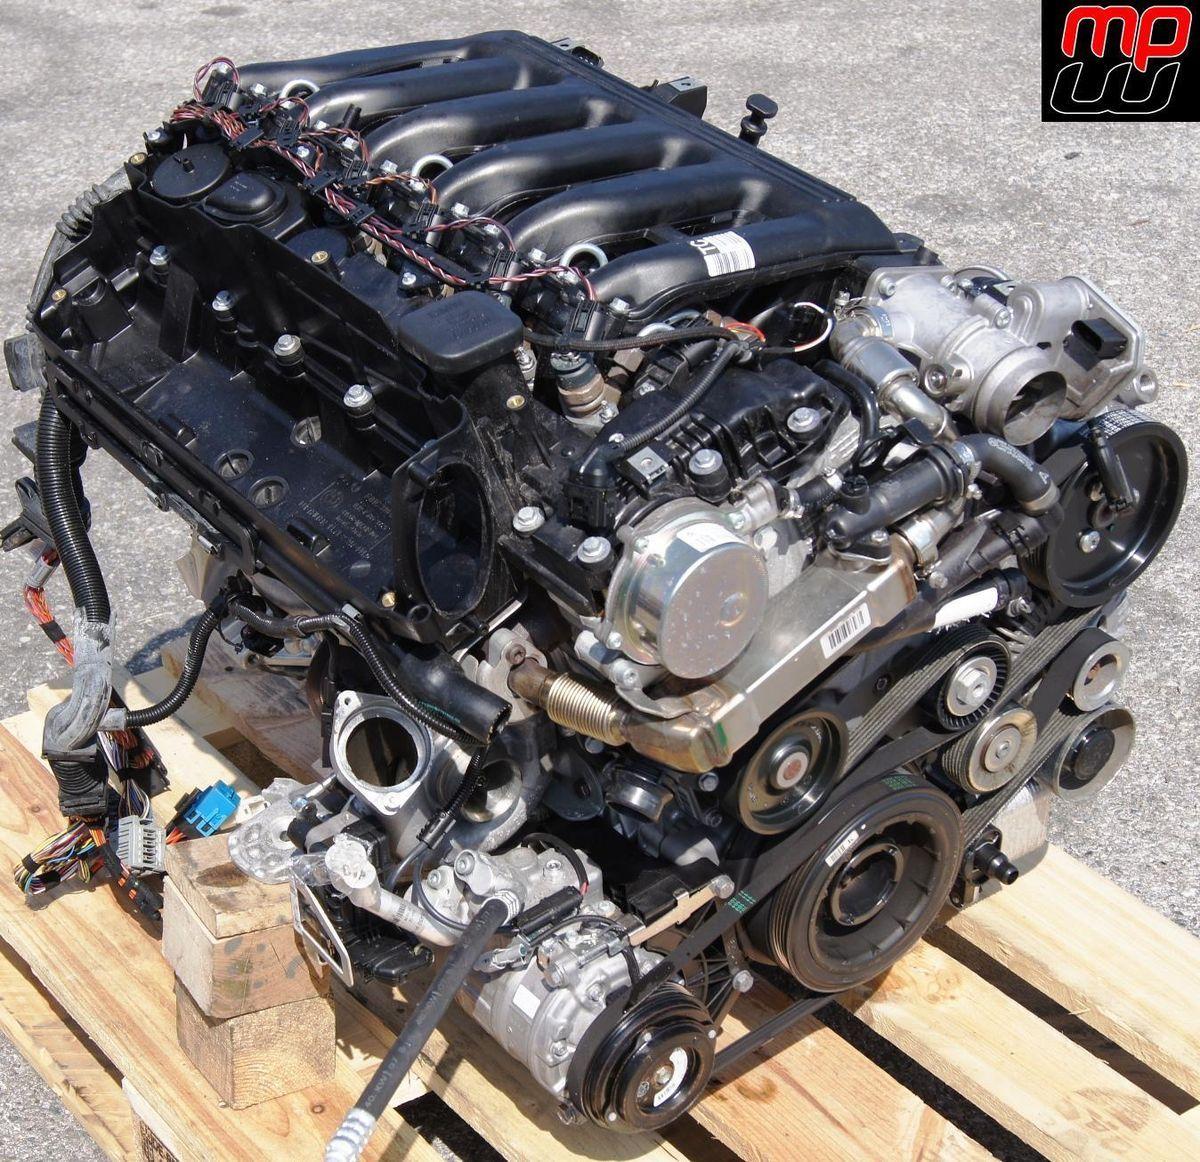 bmw n63 engine diagram find image